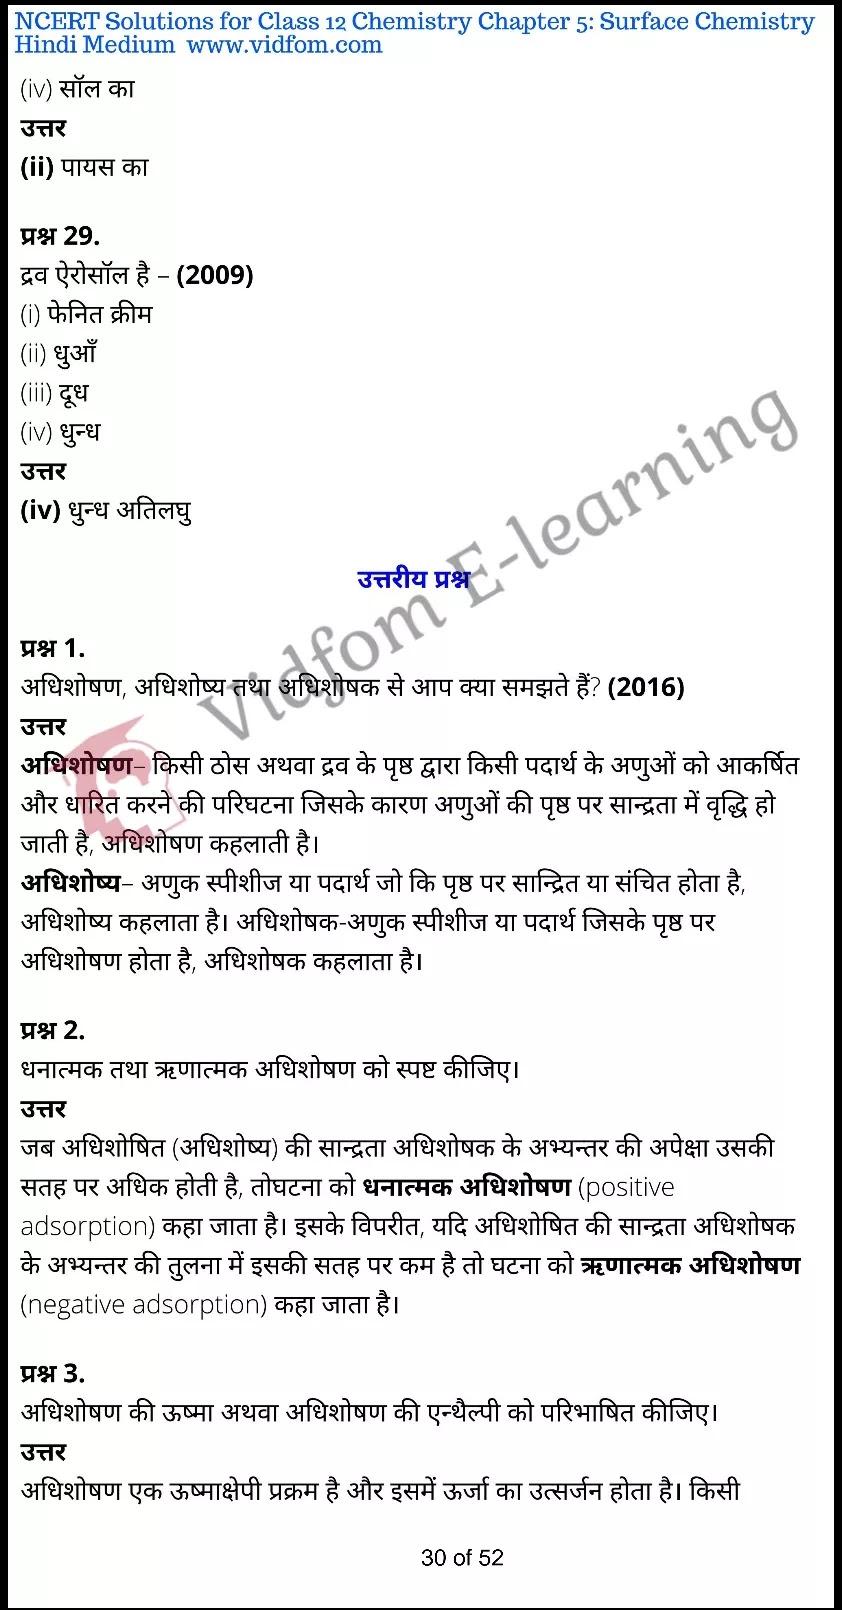 class 12 chemistry chapter 5 light hindi medium 30